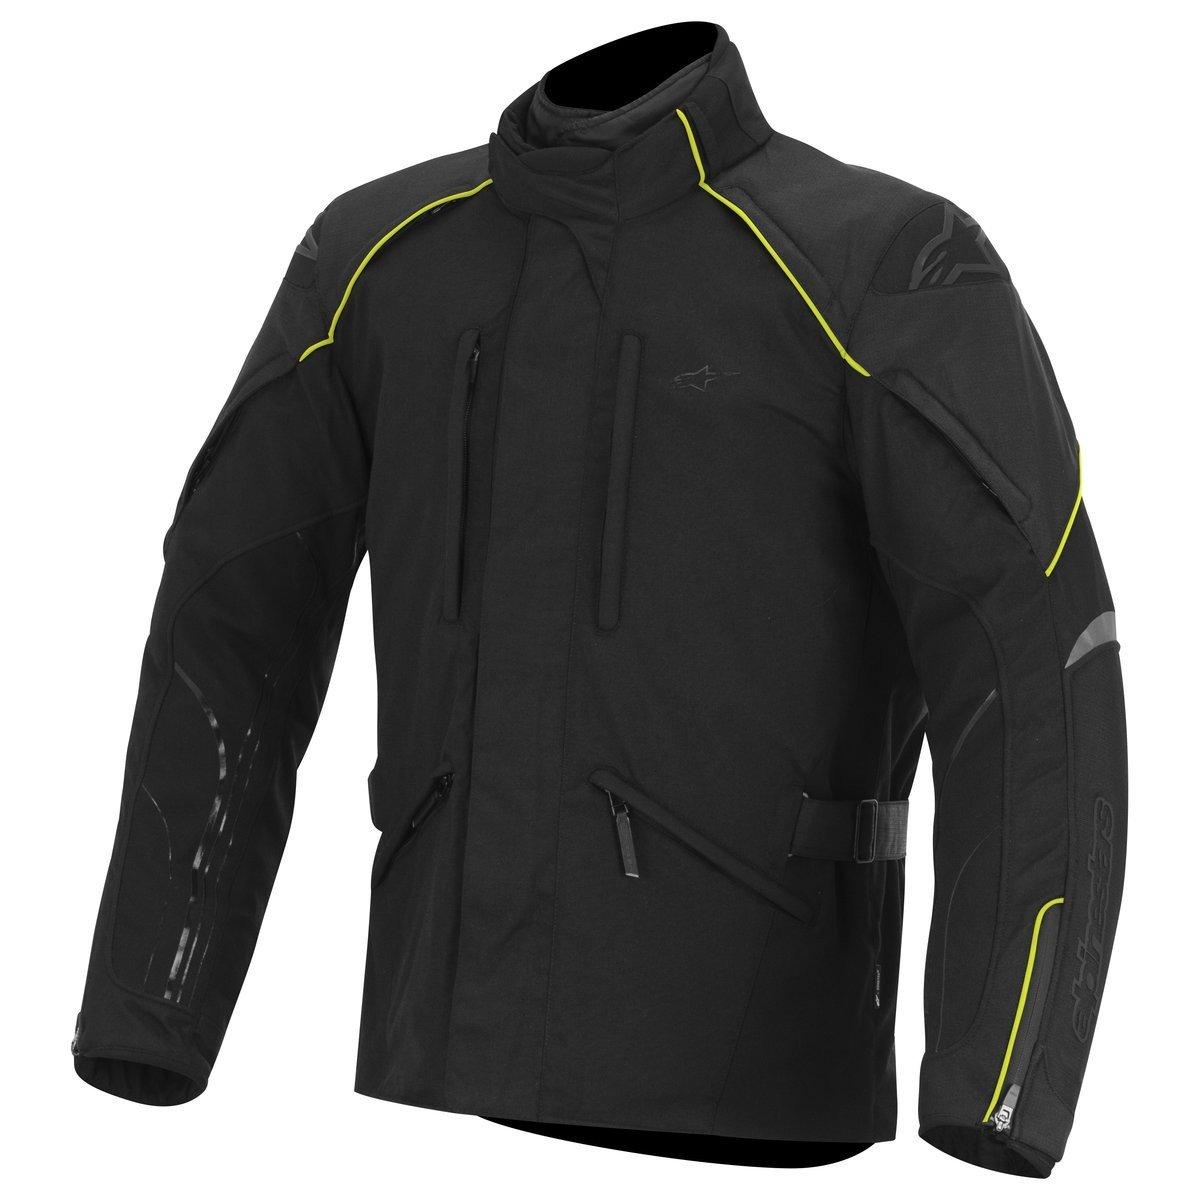 Alpinestars NEW LAND černo-žlutá New Land GTX Jacket Black/Yellow Fluo S